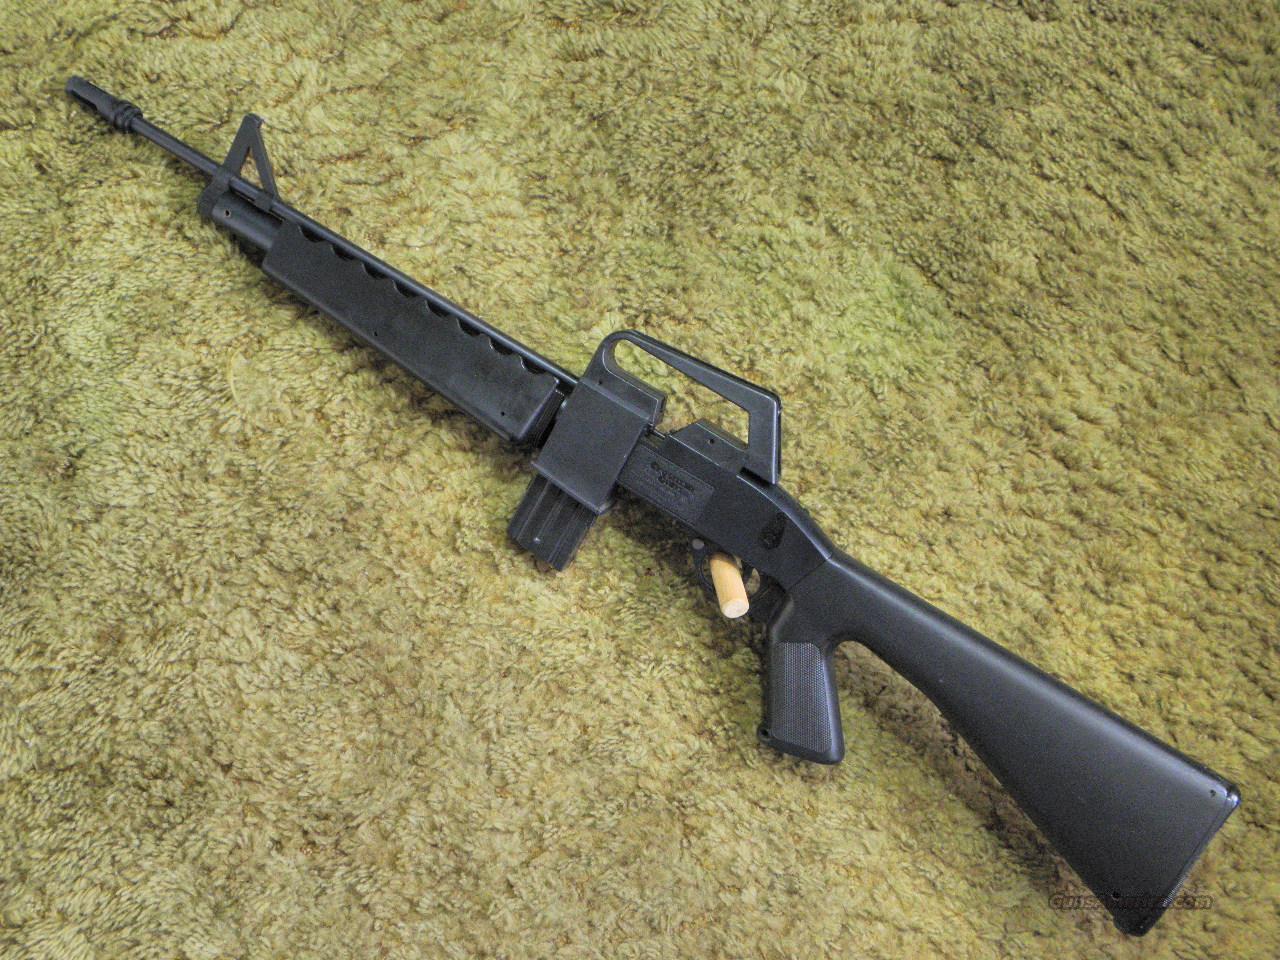 1980s Vintage Crosman AIR-17 Pellet BB Rifle AR-15 M-16